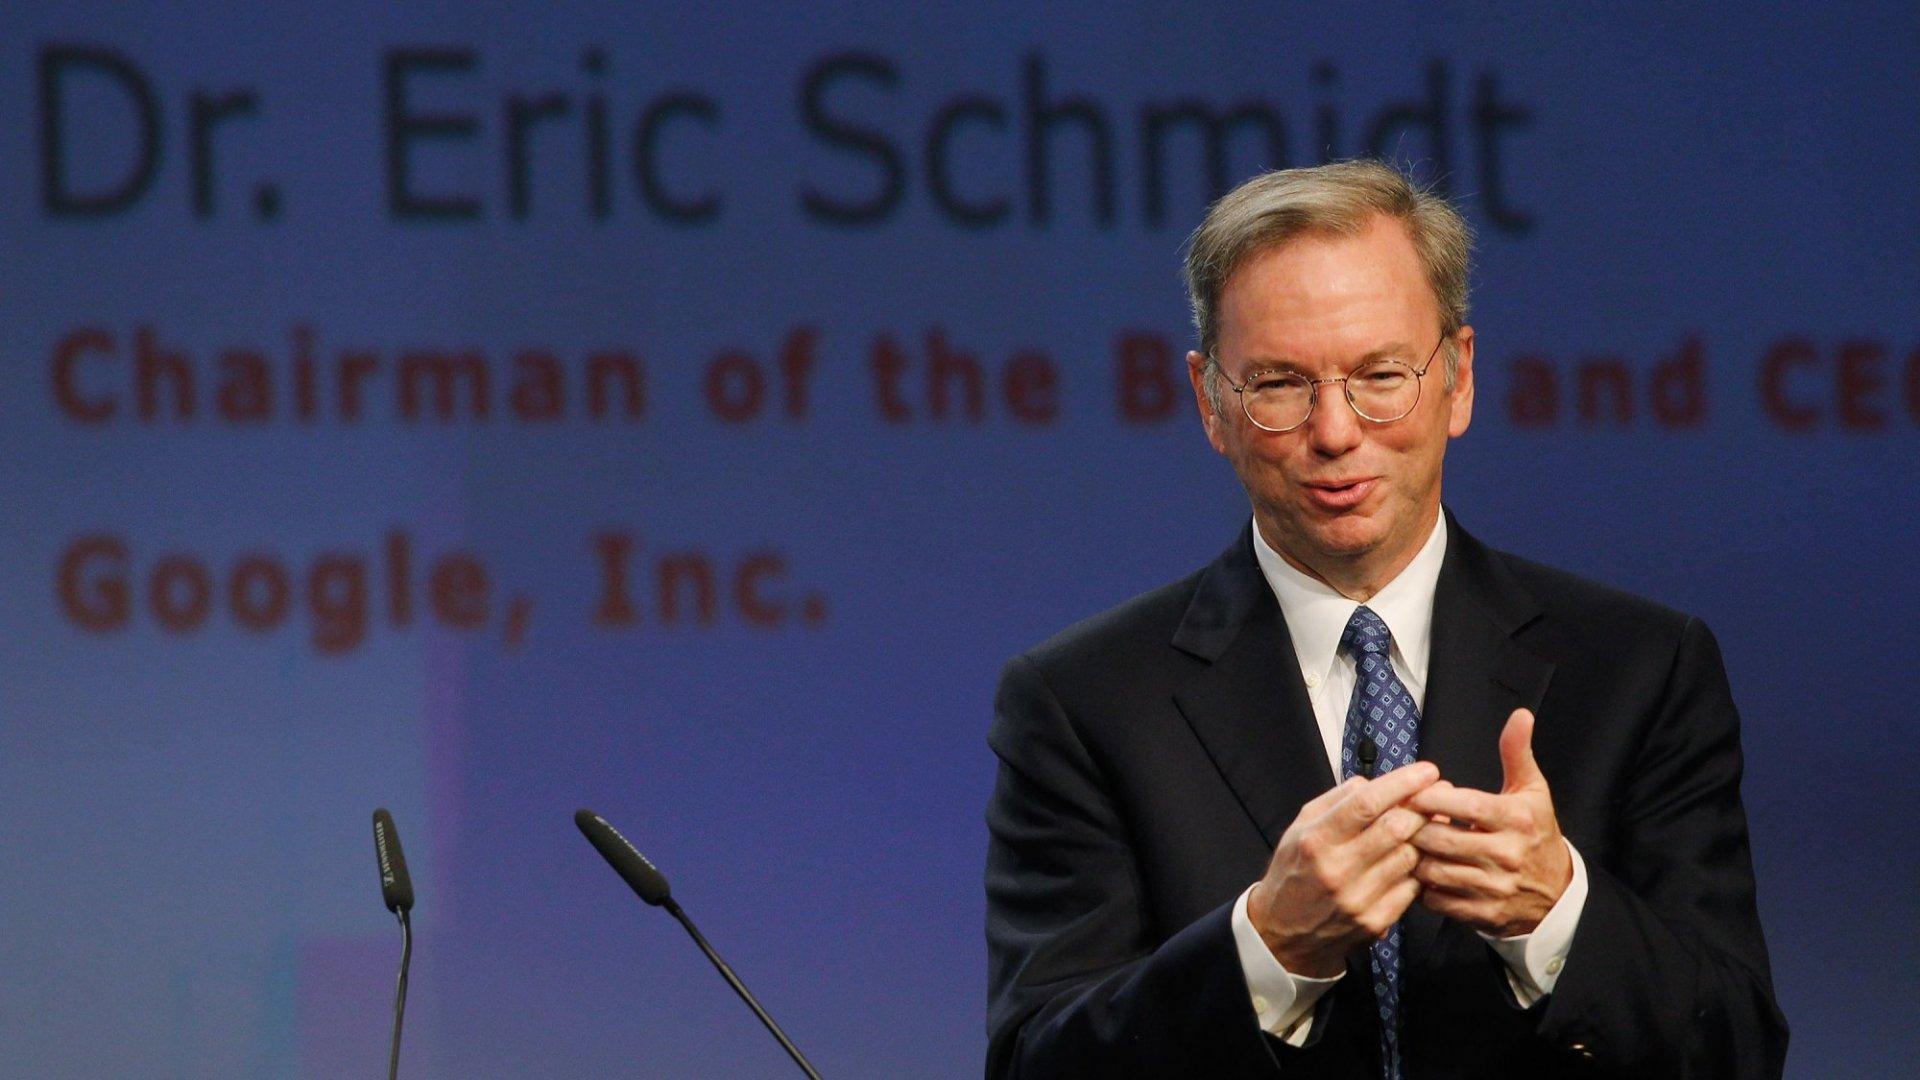 Google's Erik Schmidt Shares The Secret to a Successful Career with a Short Piece of Advice